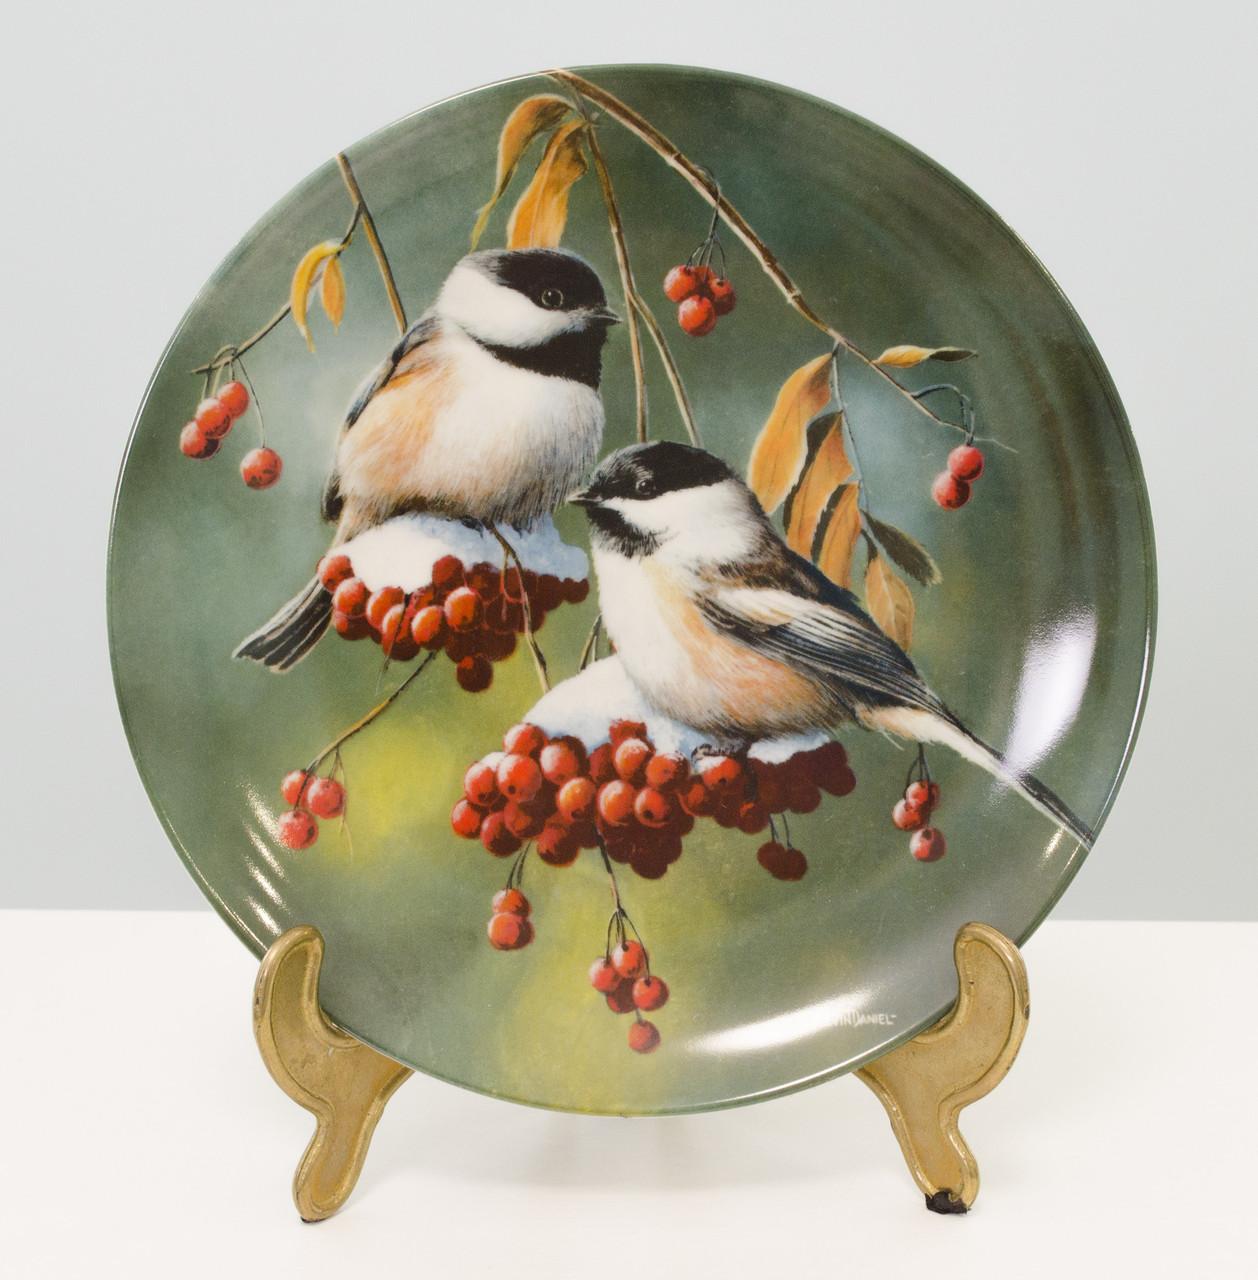 Колекційна порцелянова тарілка, фарфор, The Chickadee, Knowles, Англія, 1986 рік